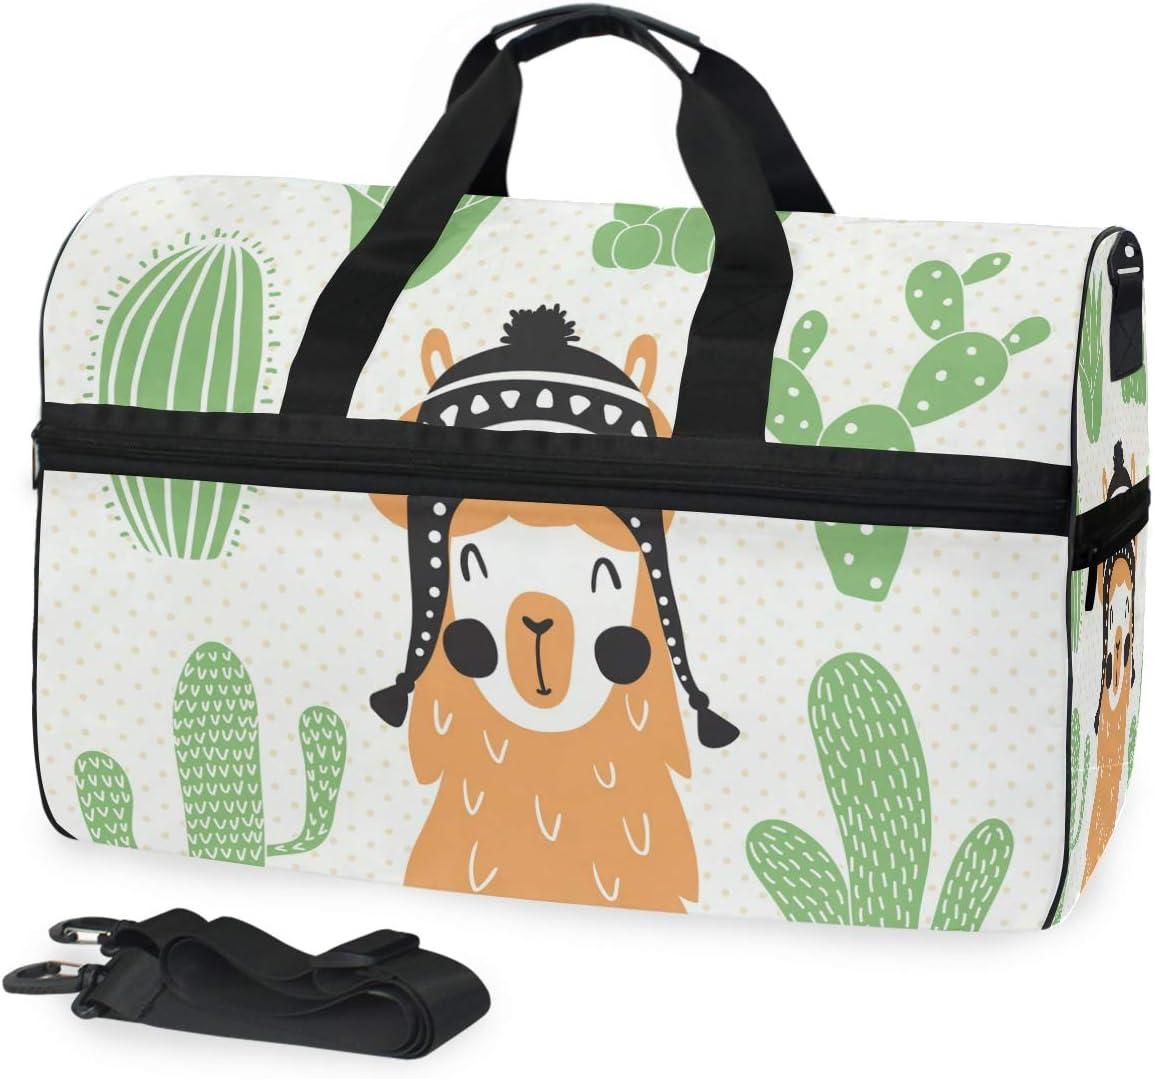 Travel Duffels Llama In Sombrero Duffle Bag Luggage Sports Gym for Women /& Men